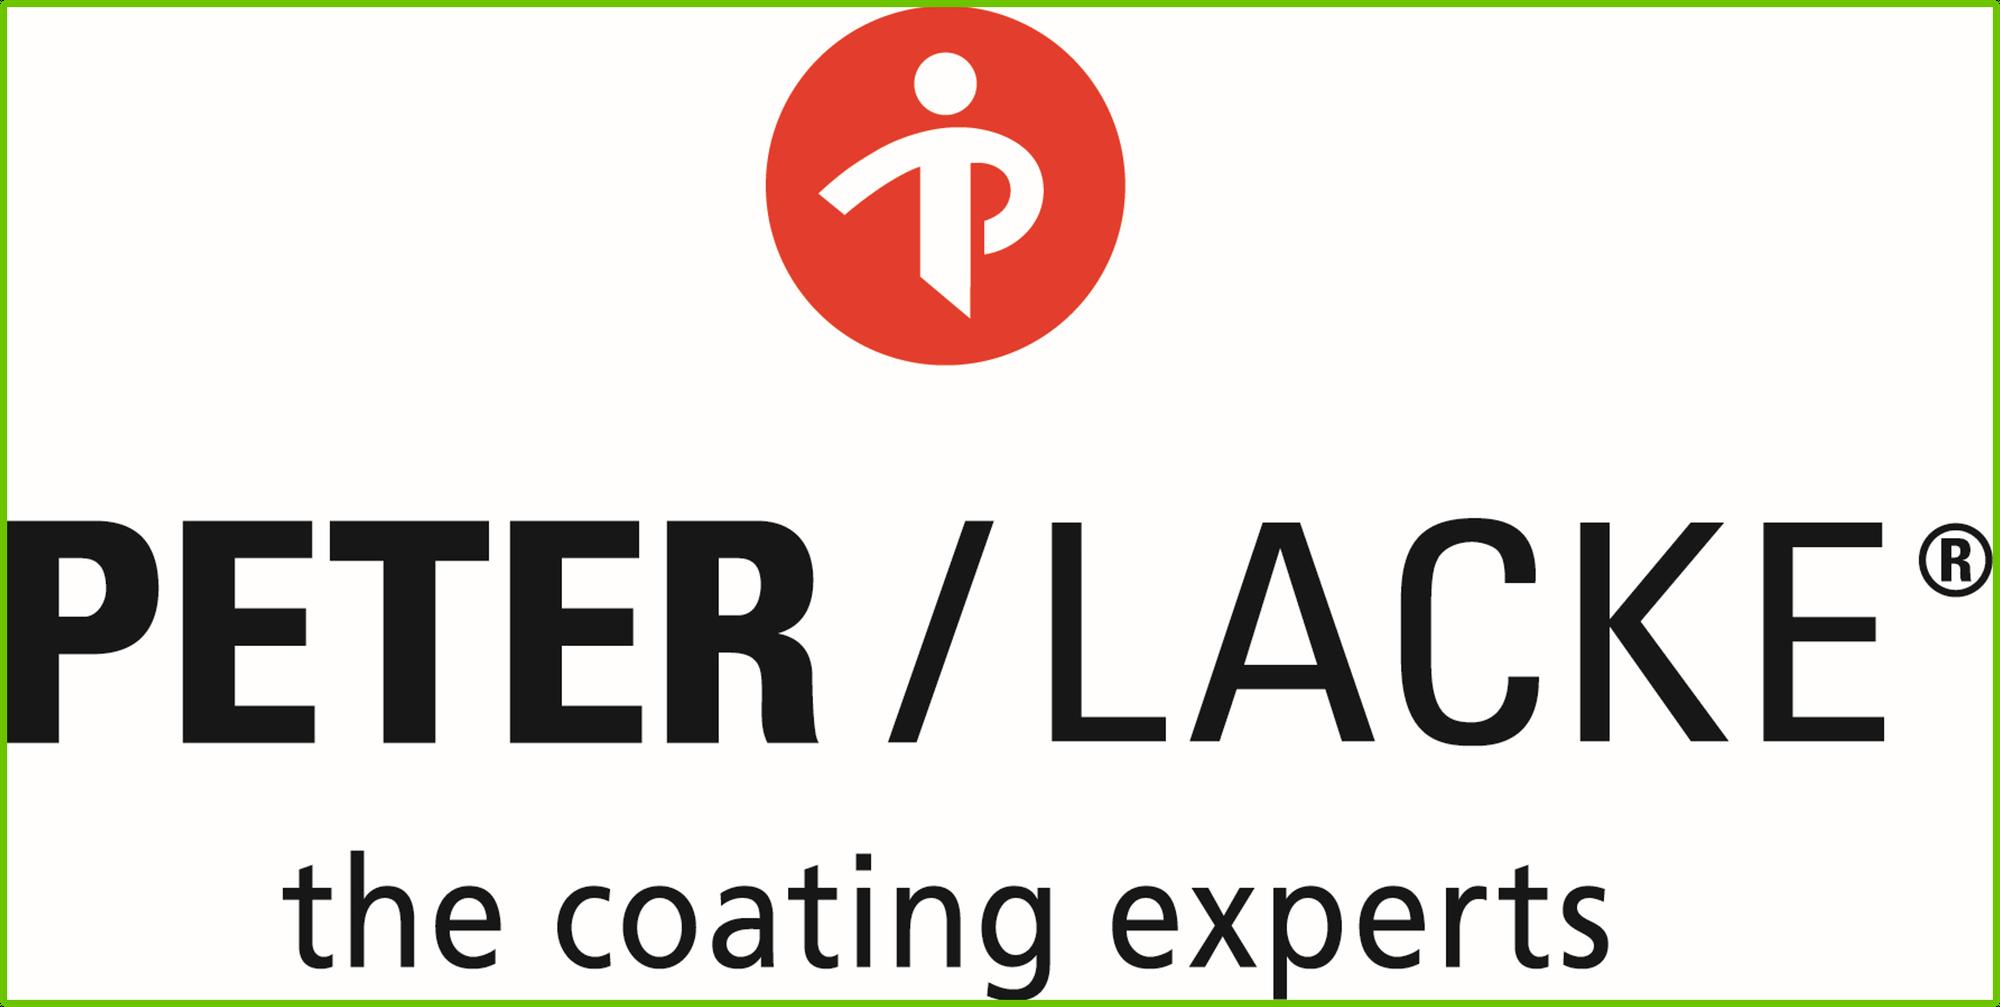 Junior Berater*innen bei PETER-LACKE GmbH